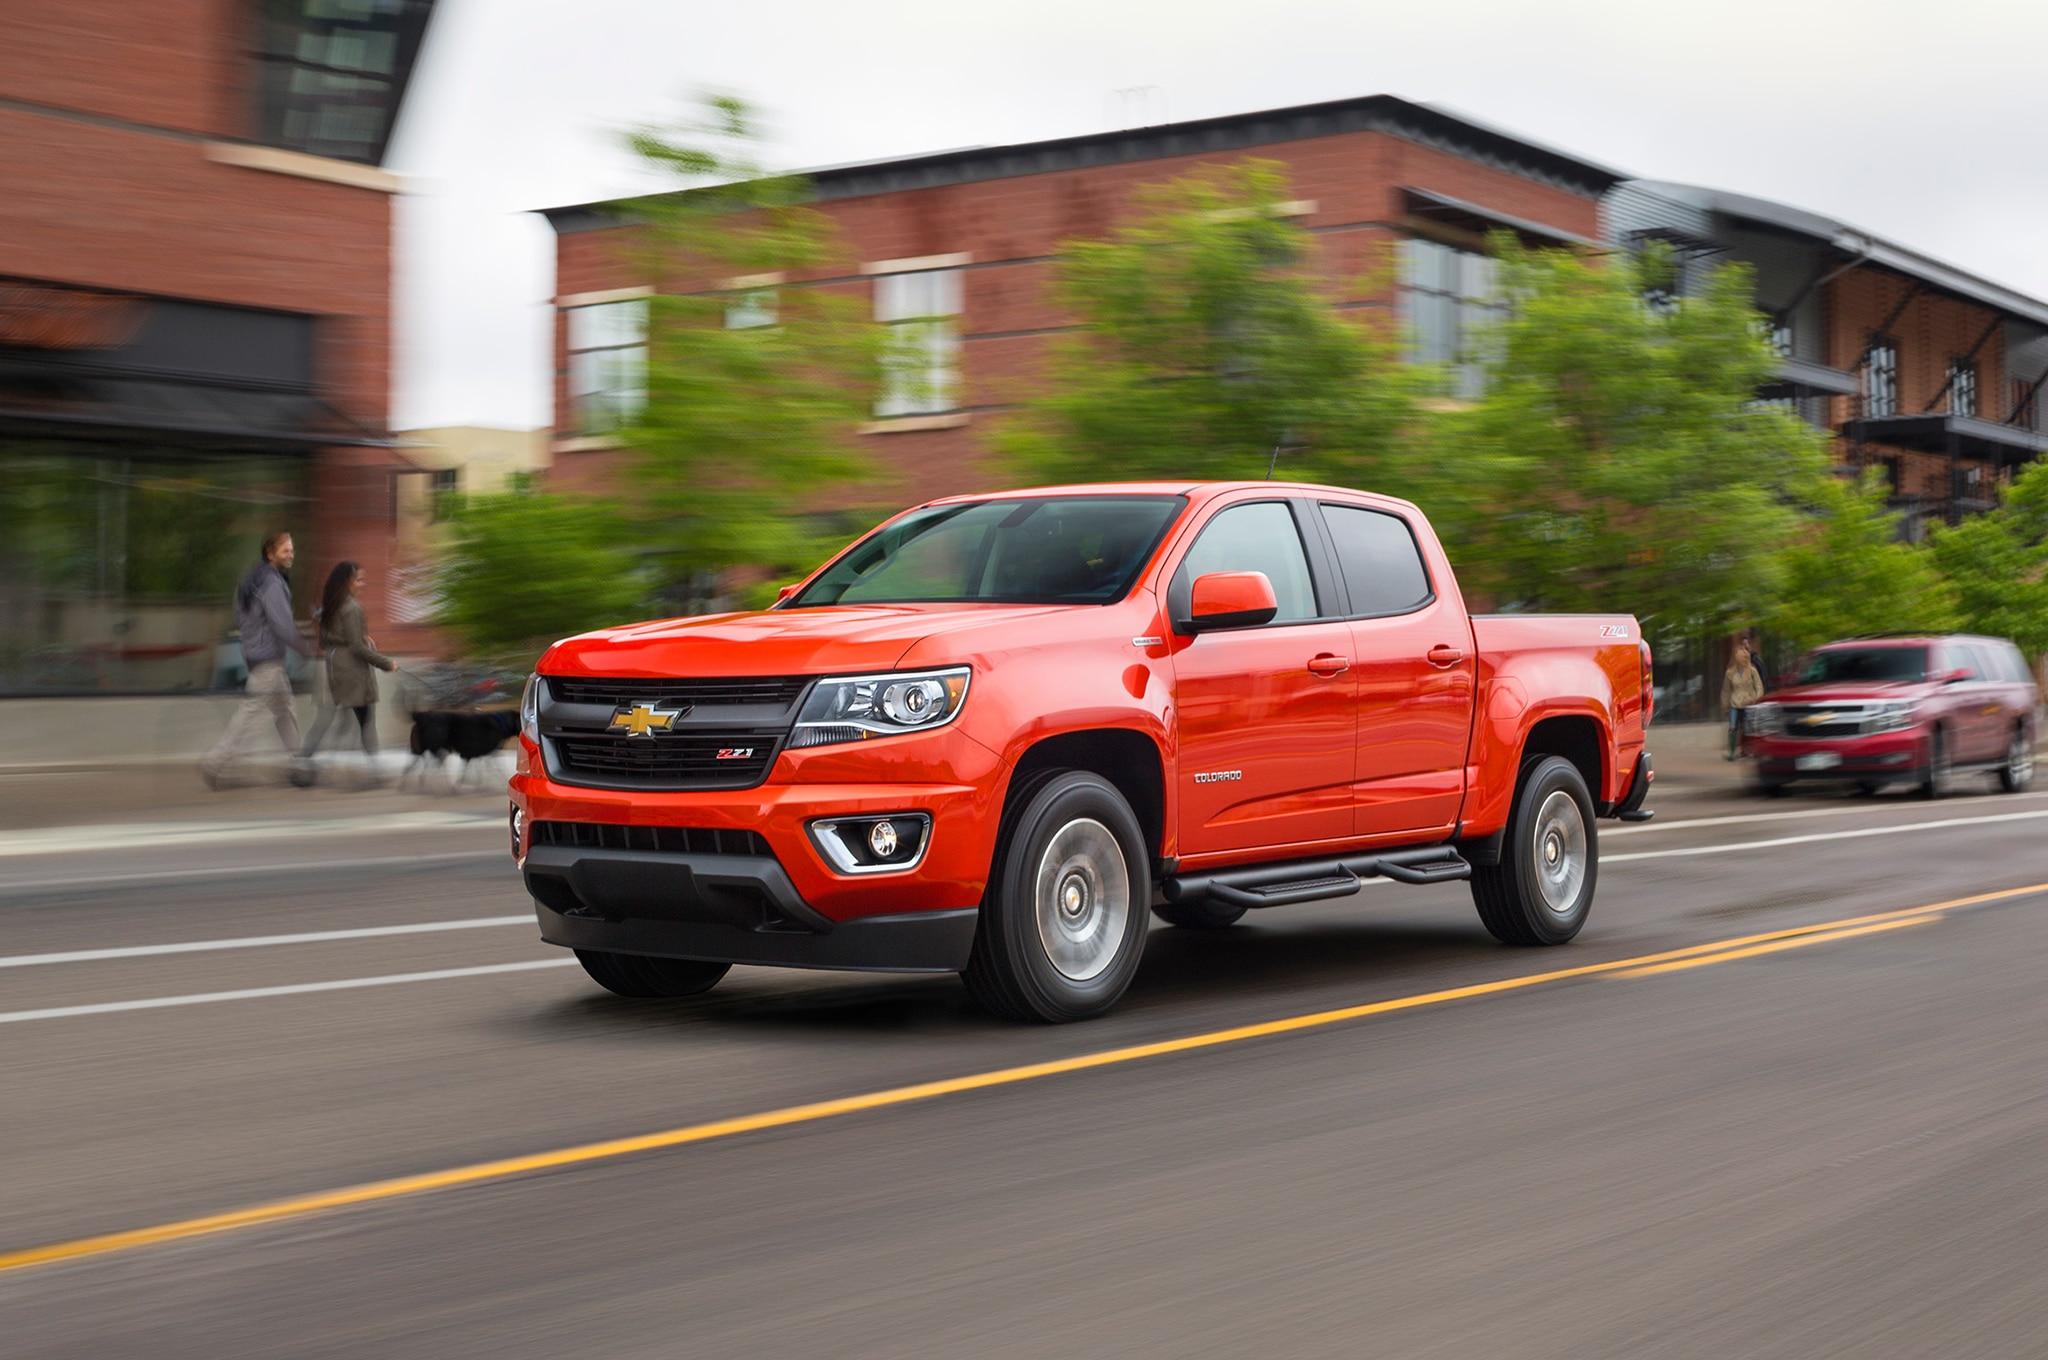 2016 Chevrolet Colorado Duramax Diesel Belts Out 369 lb-ft